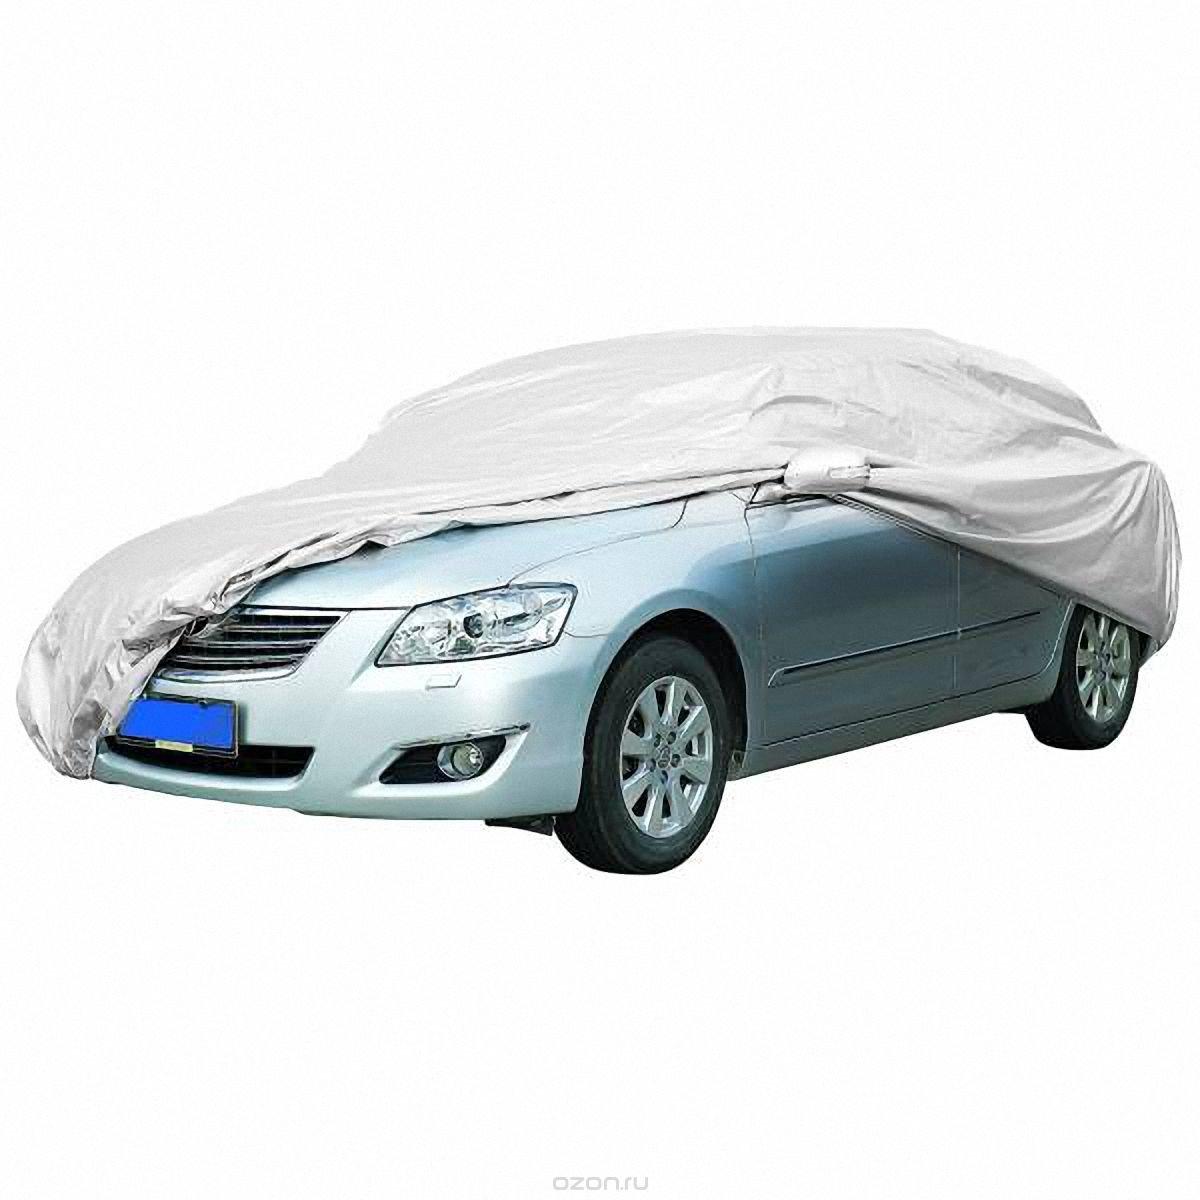 "Чехол-тент автомобильный ""Skyway"", 570 х 203 х 119 см. Размер 2XL"